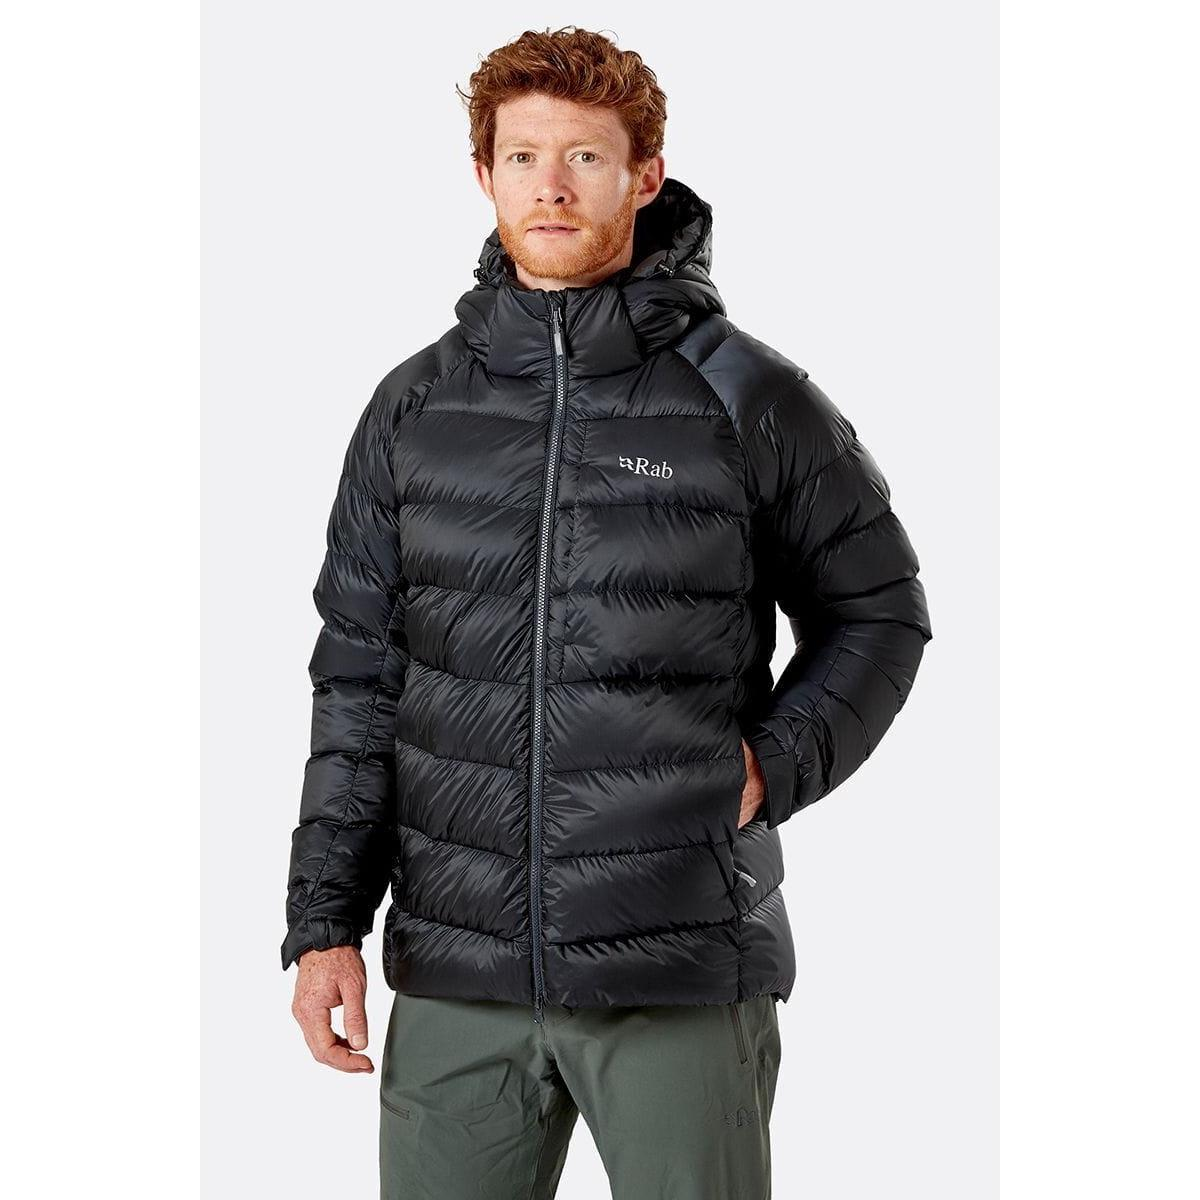 Rab Men's Rab Axion Pro Jacket - Black